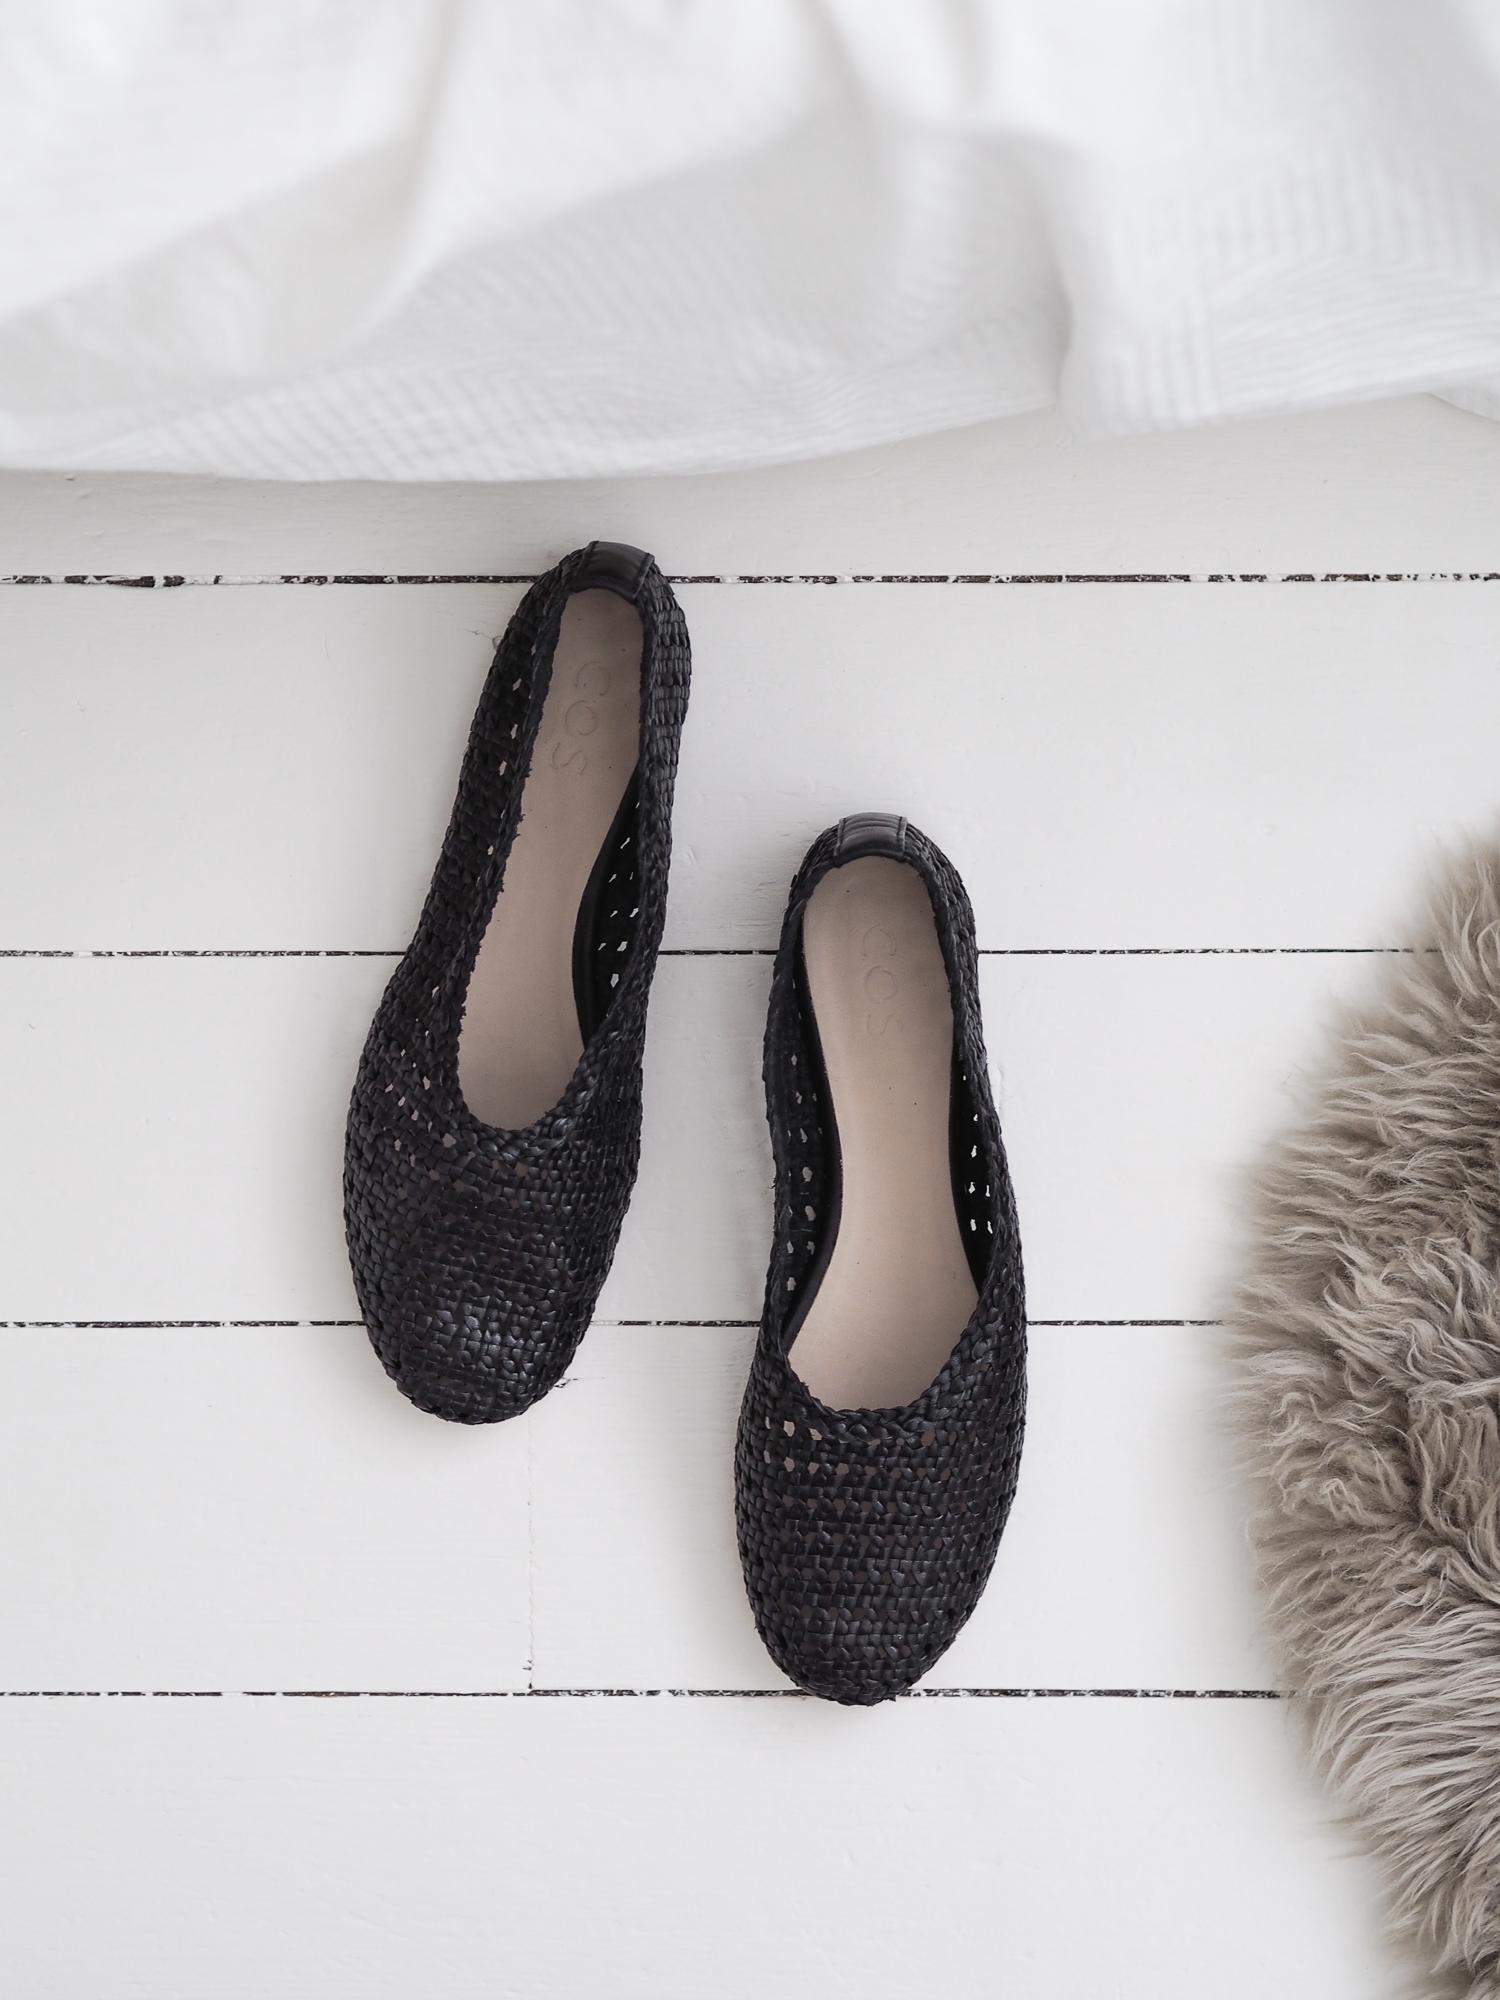 Cos shoes   Design Hunter